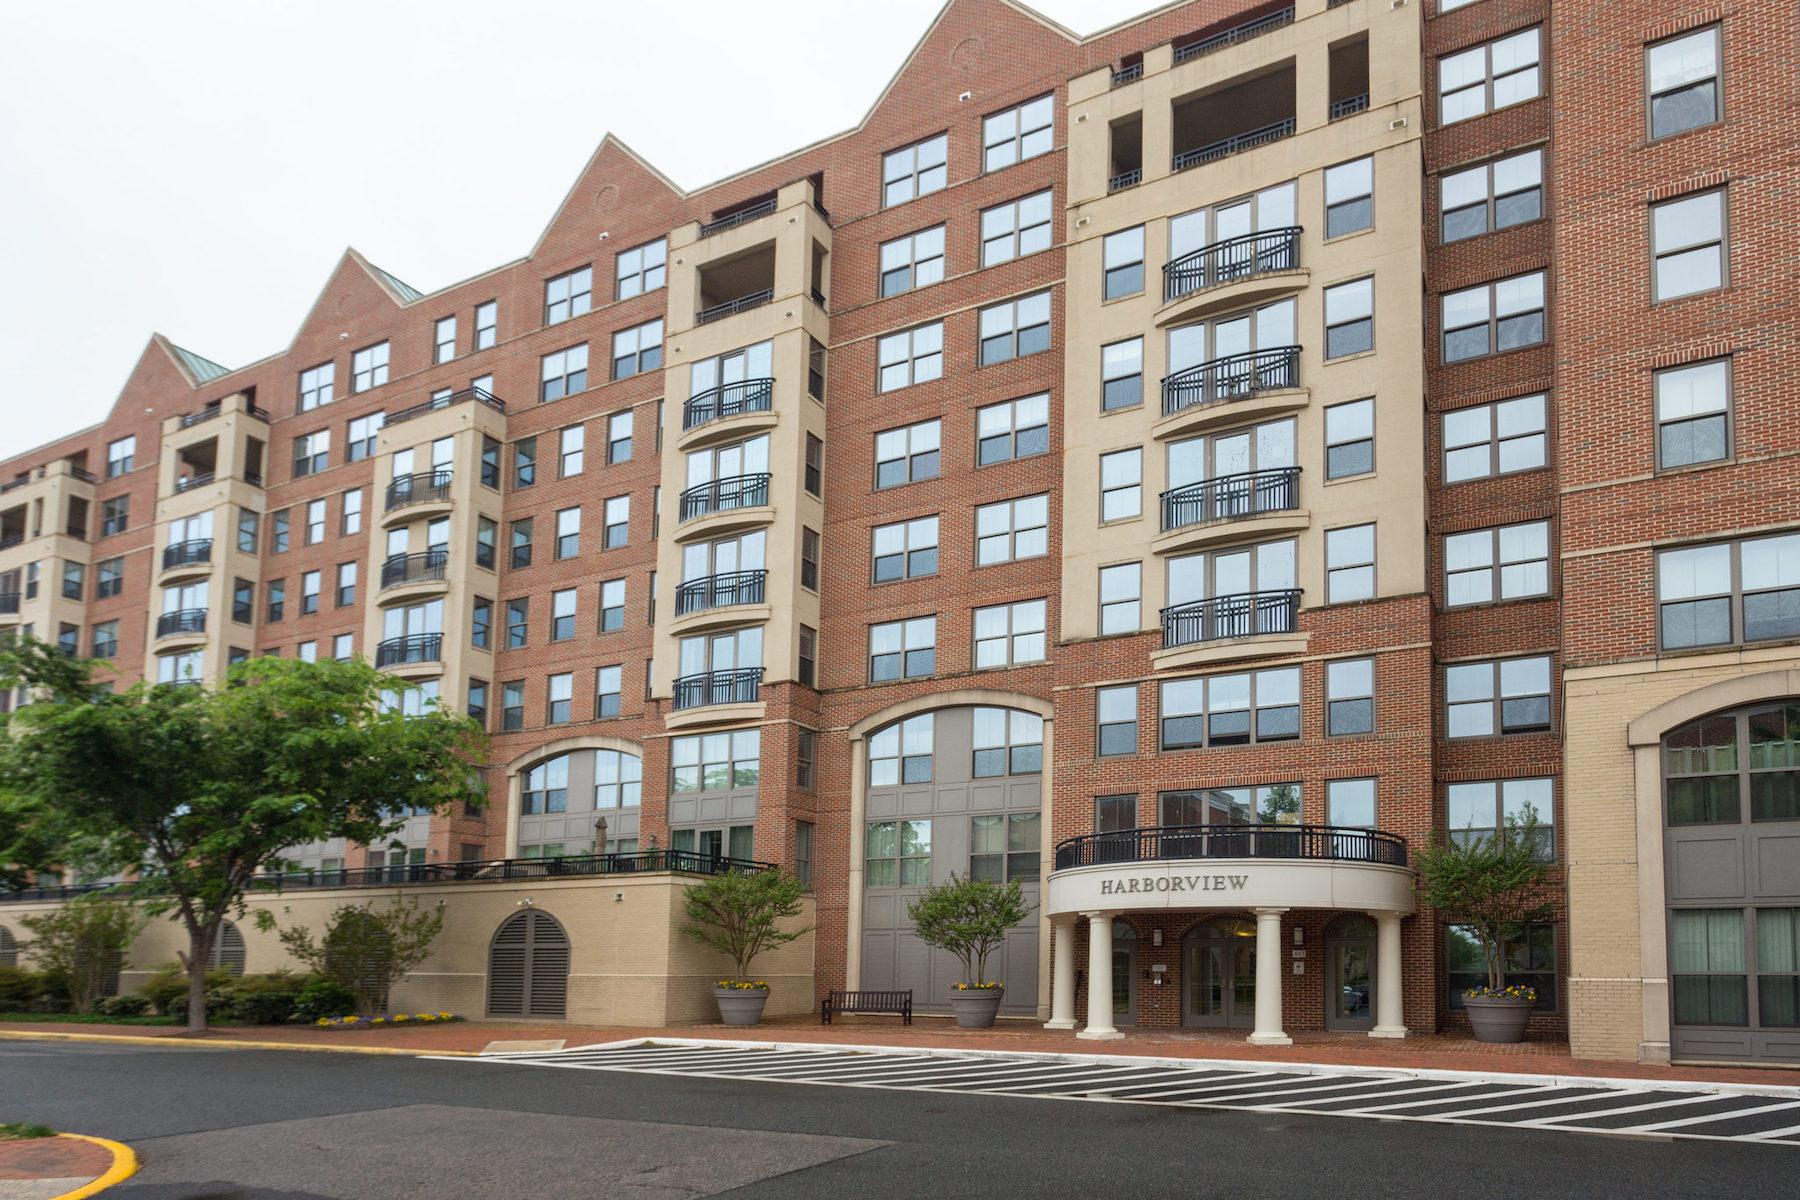 Condominium for Sale at 485 Harbor Side Street 406, Woodbridge 485 Harbor Side St 406 Woodbridge, Virginia, 22191 United States